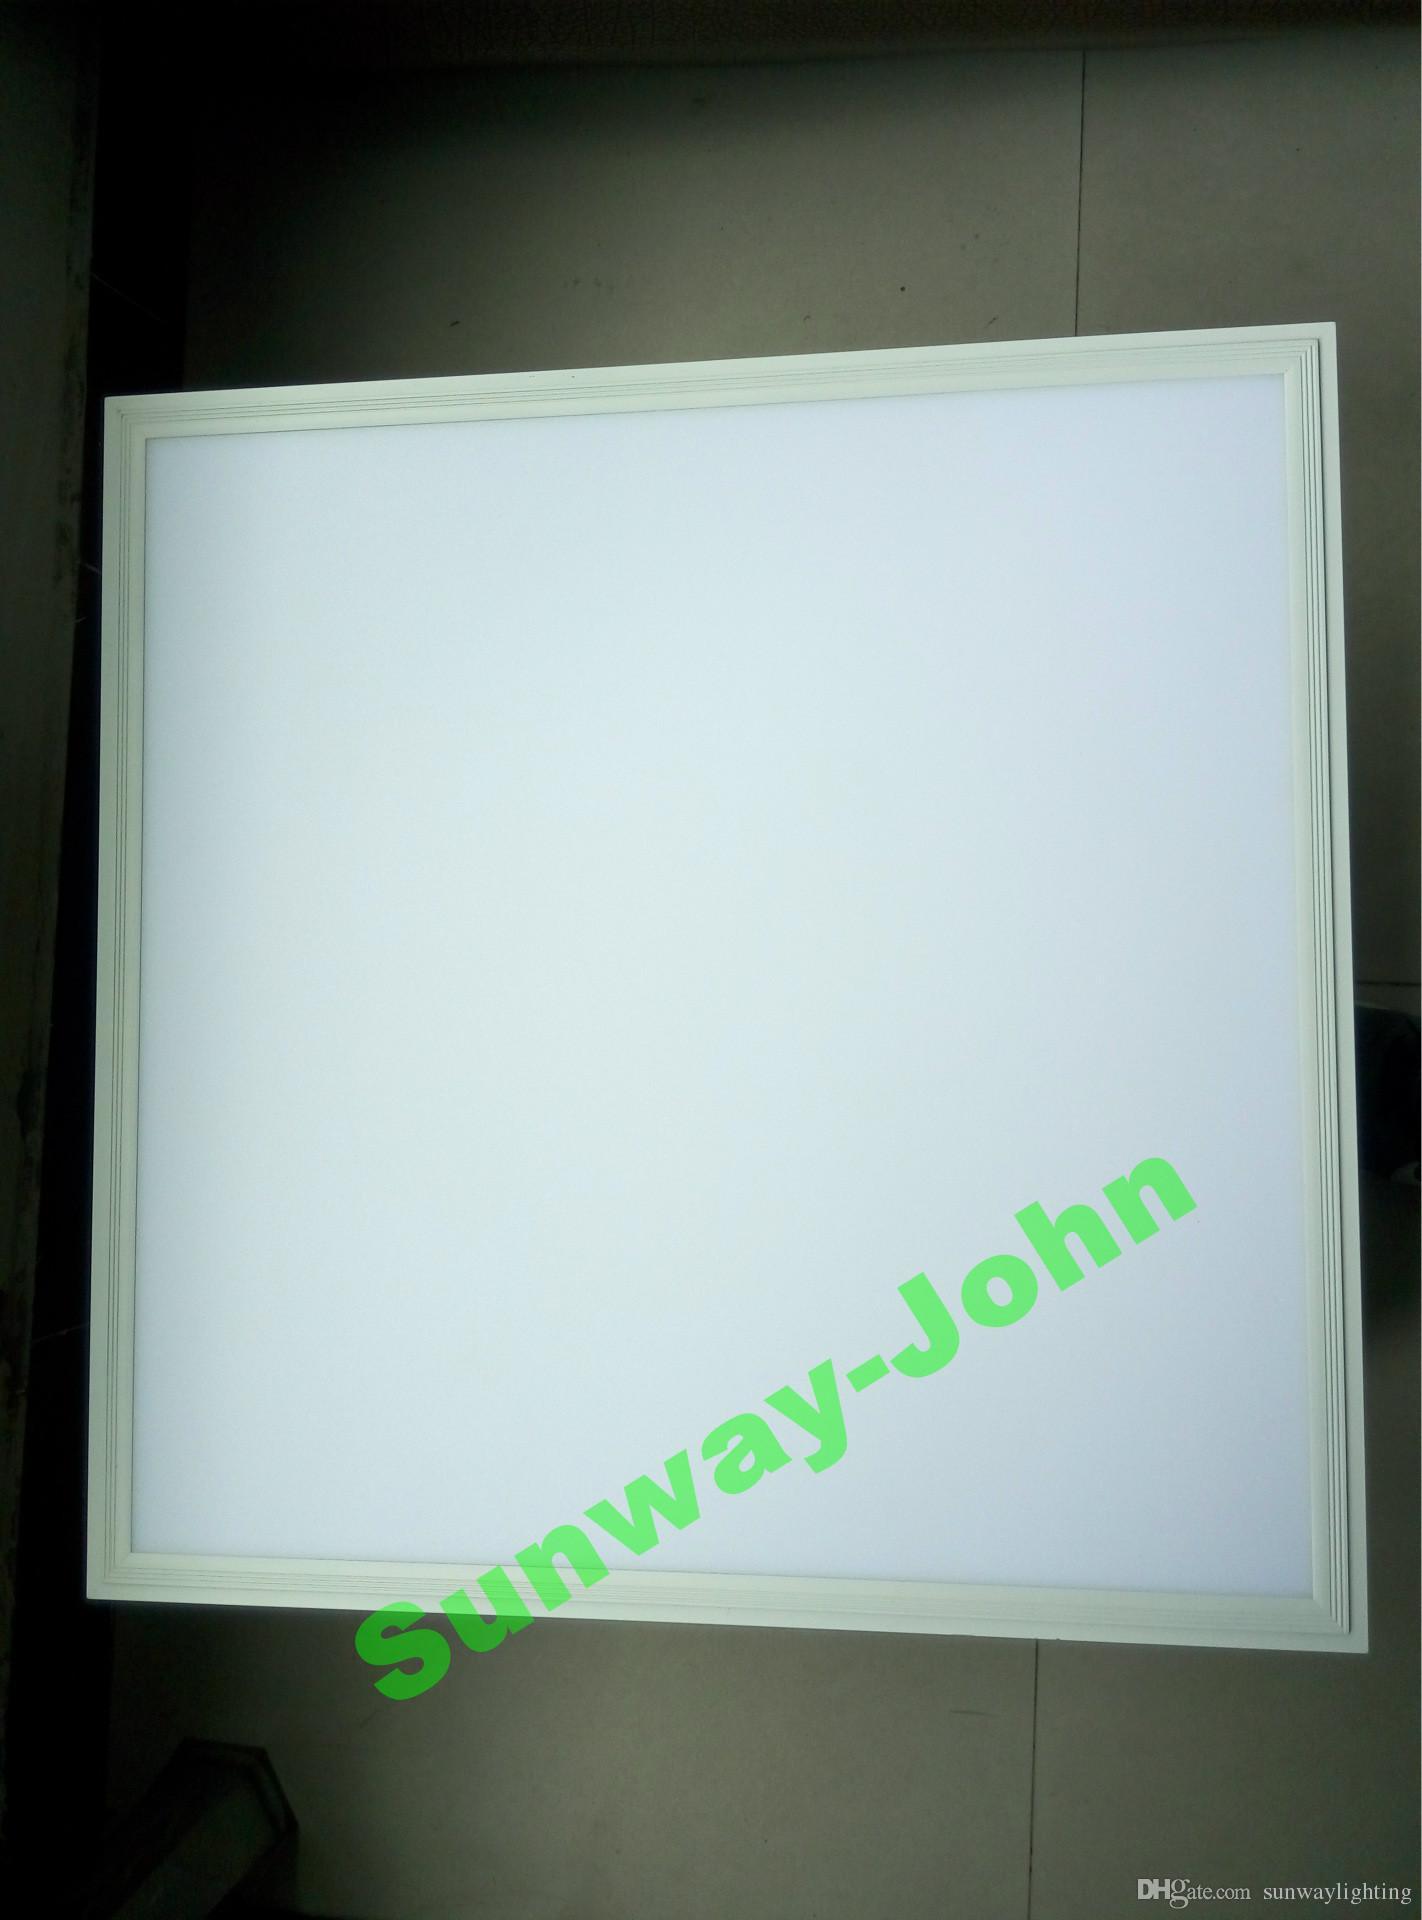 CE UL 화이트 프레임 2x2 2x4 LED 패널 조명 600x600mm 36W 48 54W 72W 플랫 LED 천장 패널 빛 따뜻한 자연 흰색 AC85-265V